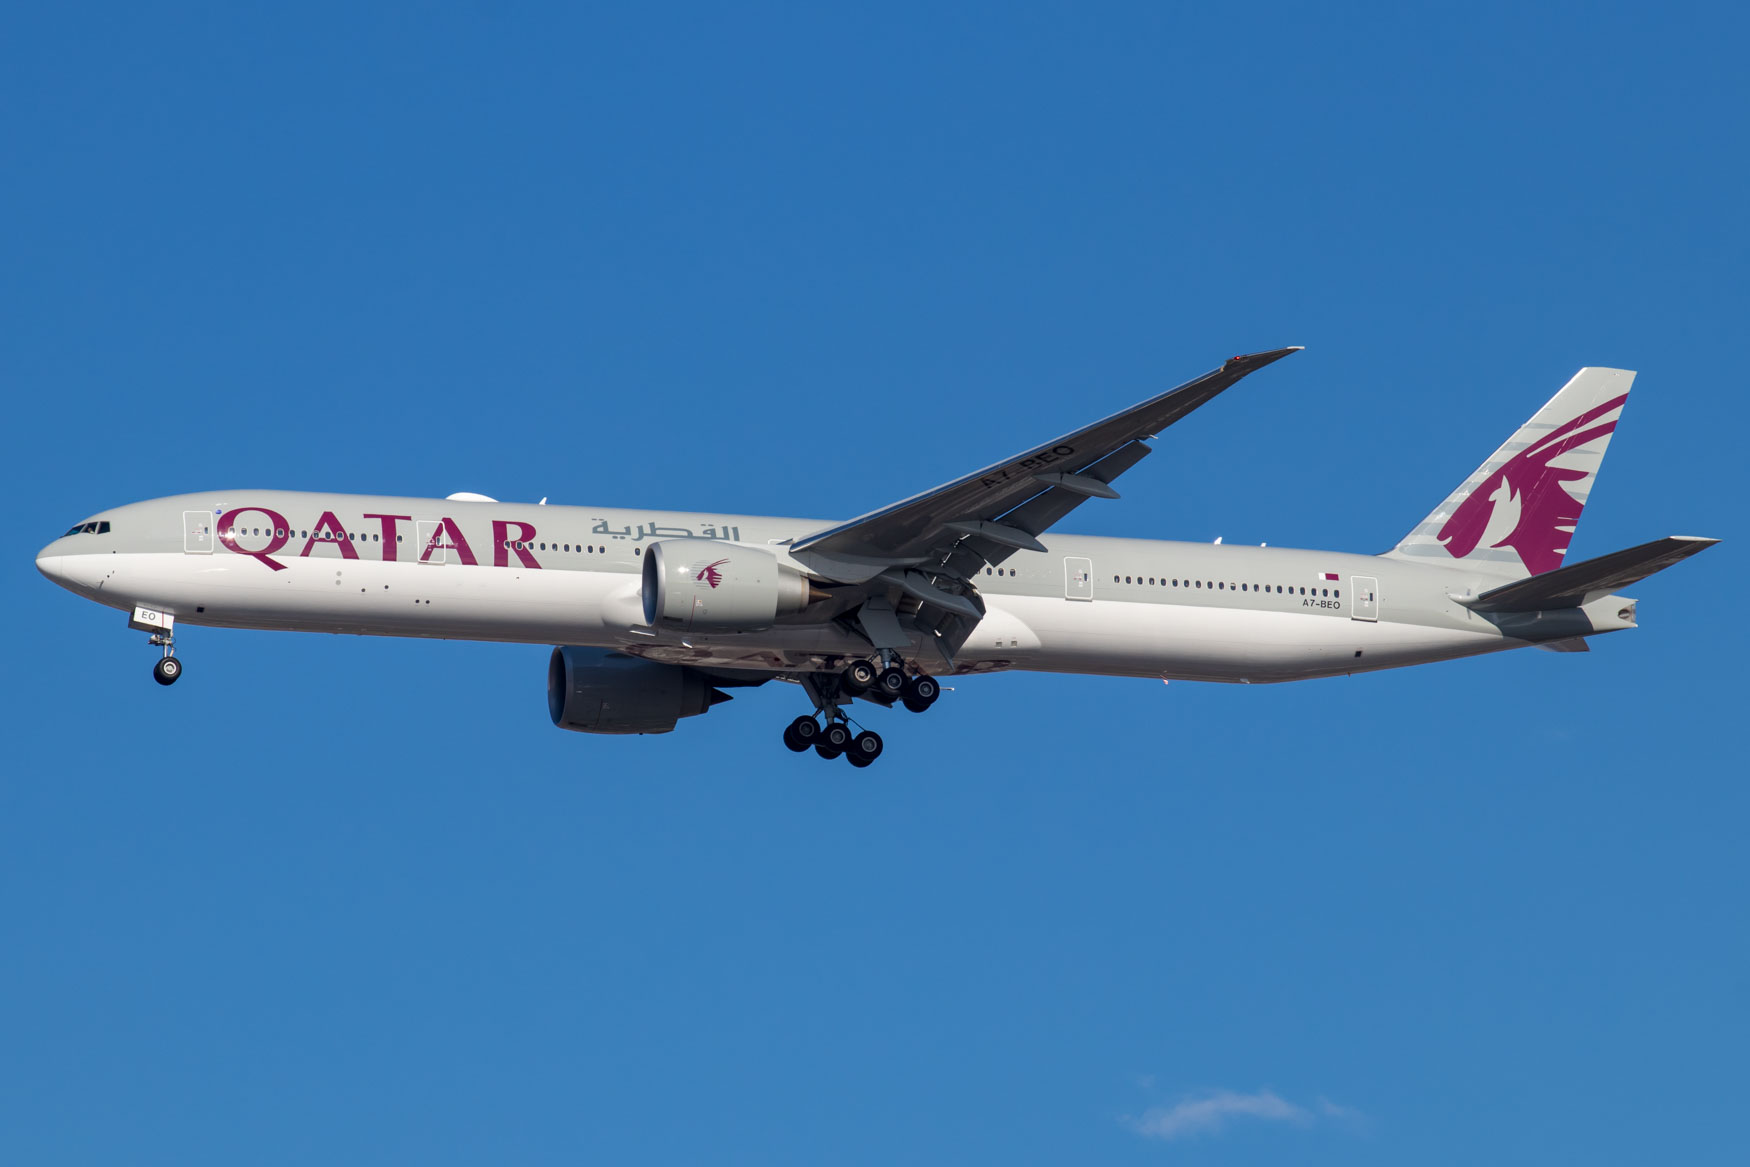 Qatar Airways 777-300ER Landing at JFK